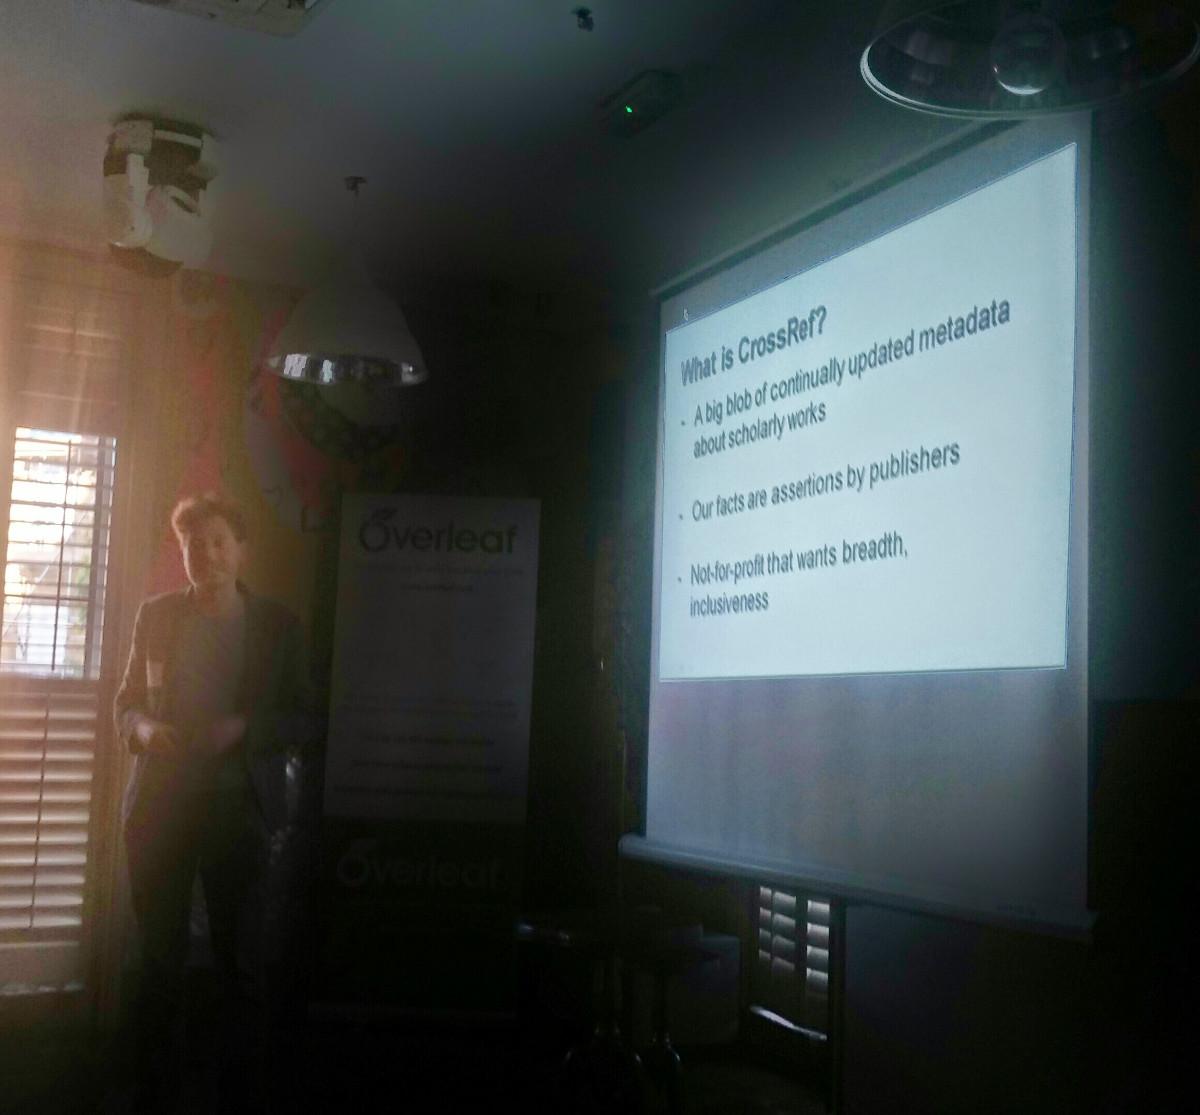 Overleaf futurepub 5 Karl CrossRef API demo